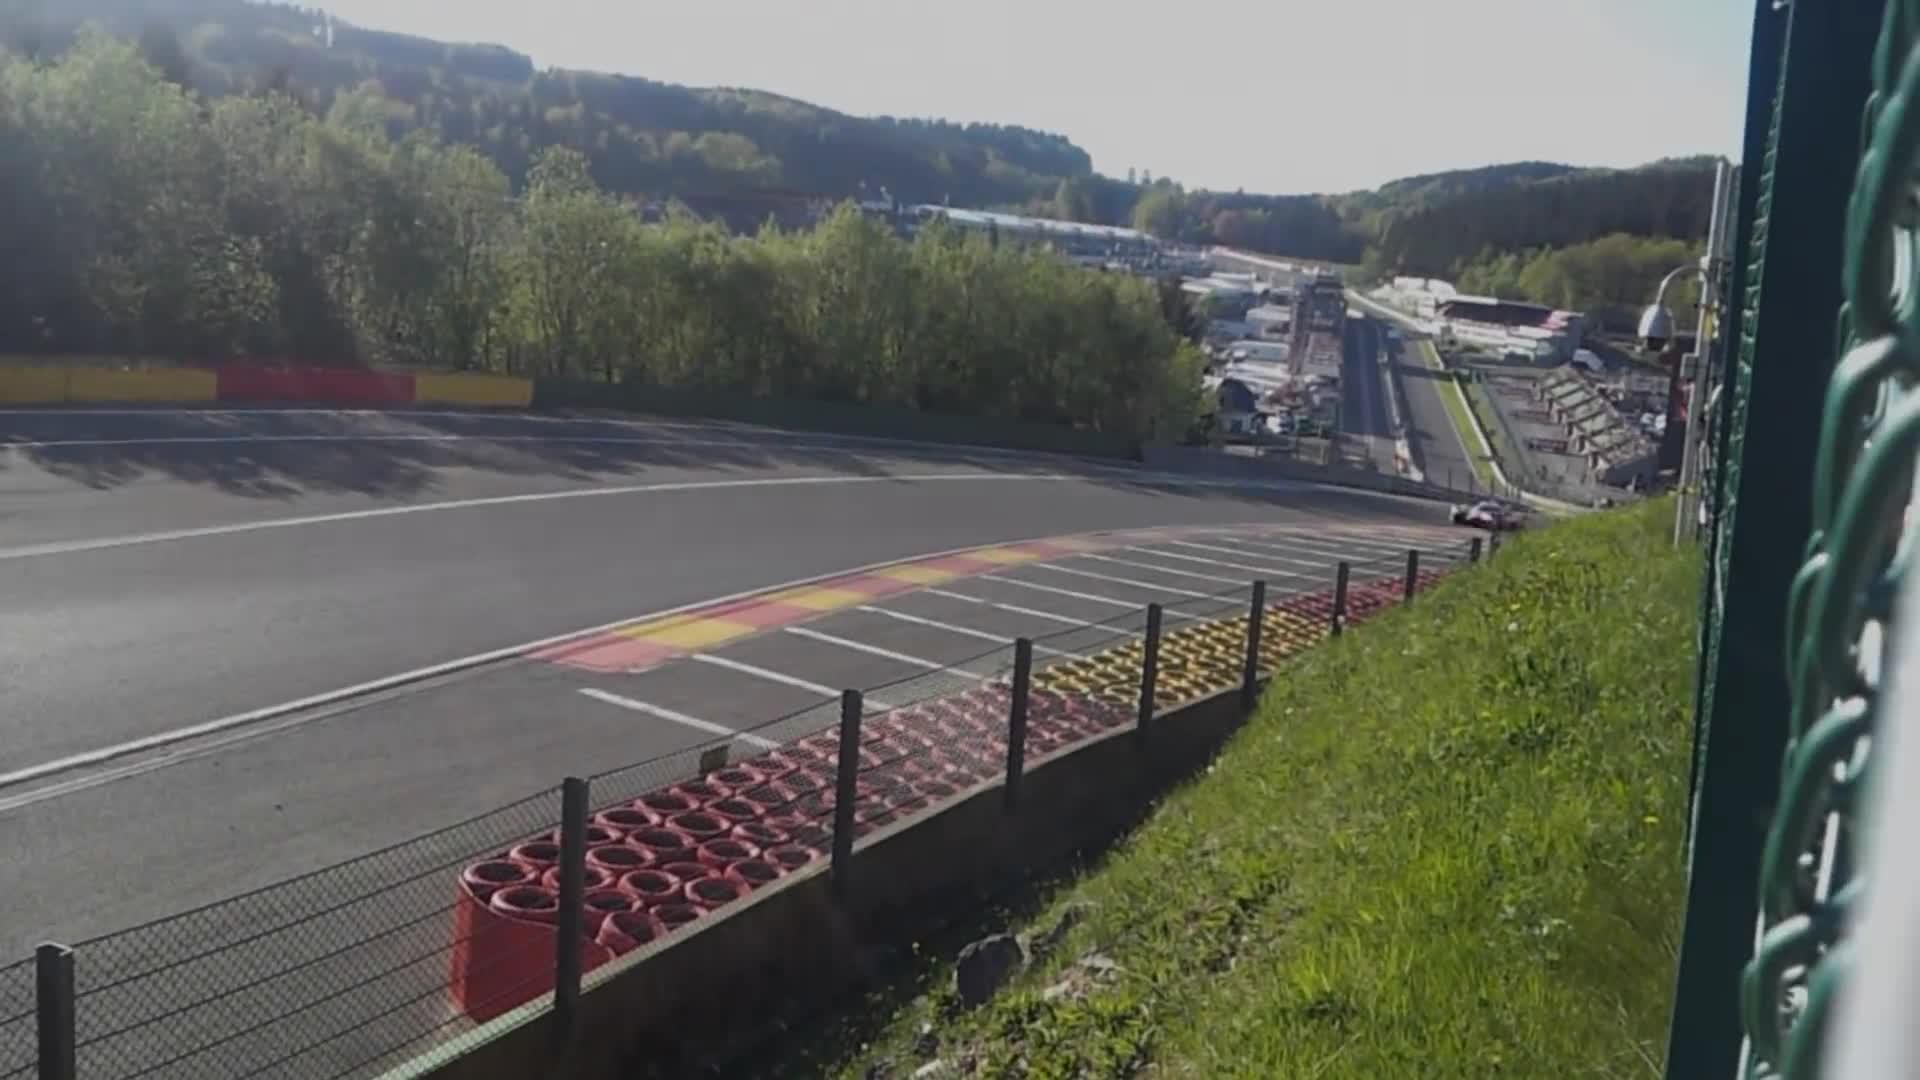 FIA WEC 2018 Spa Francorchamps Crash #17 BR Engineering BR1-AER Eau Rouge GIFs